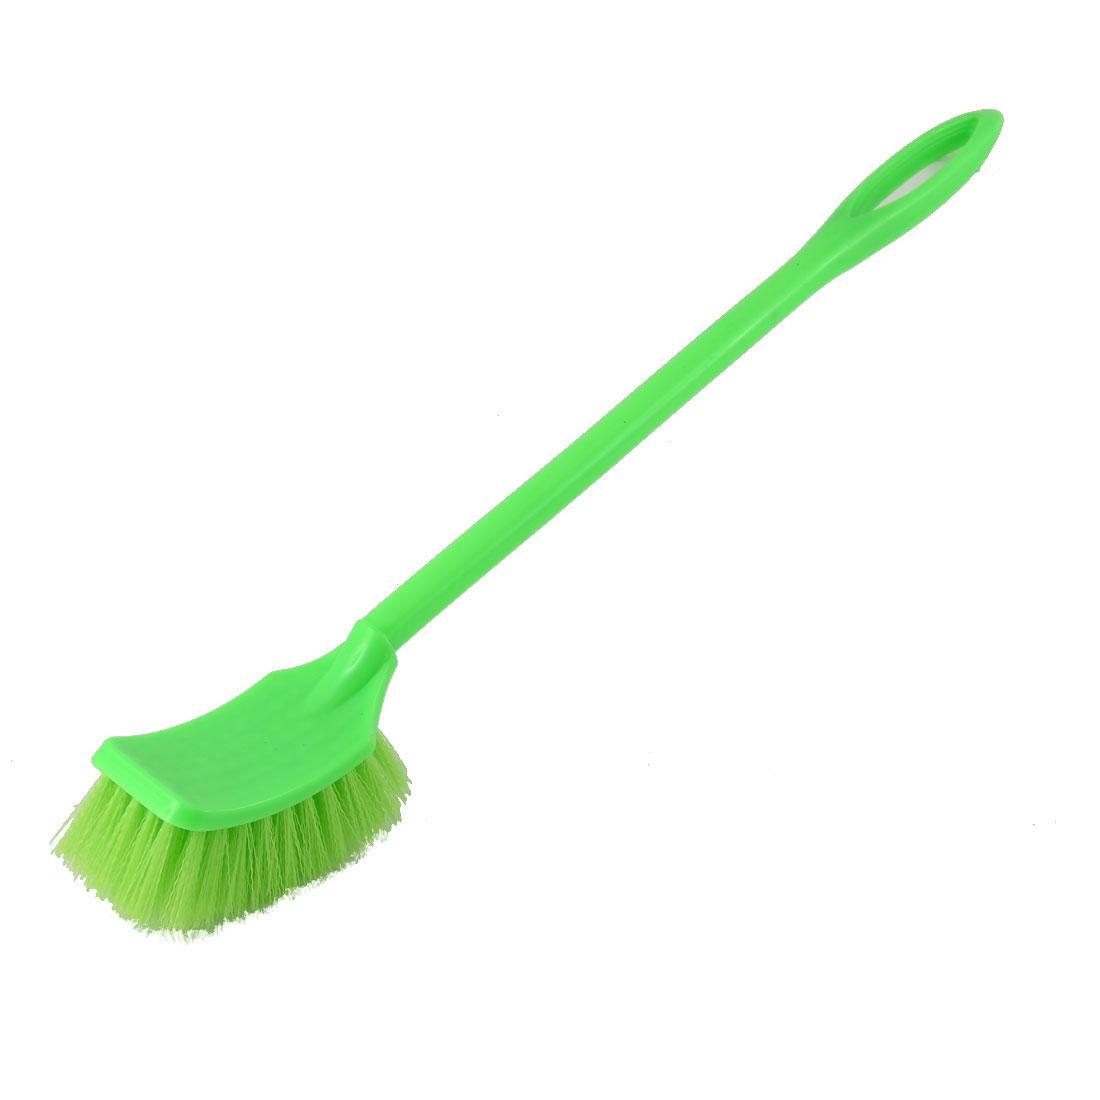 Bathroom Cleaning Plastic Handle Nylon Bristle Toilet Brush Light Green